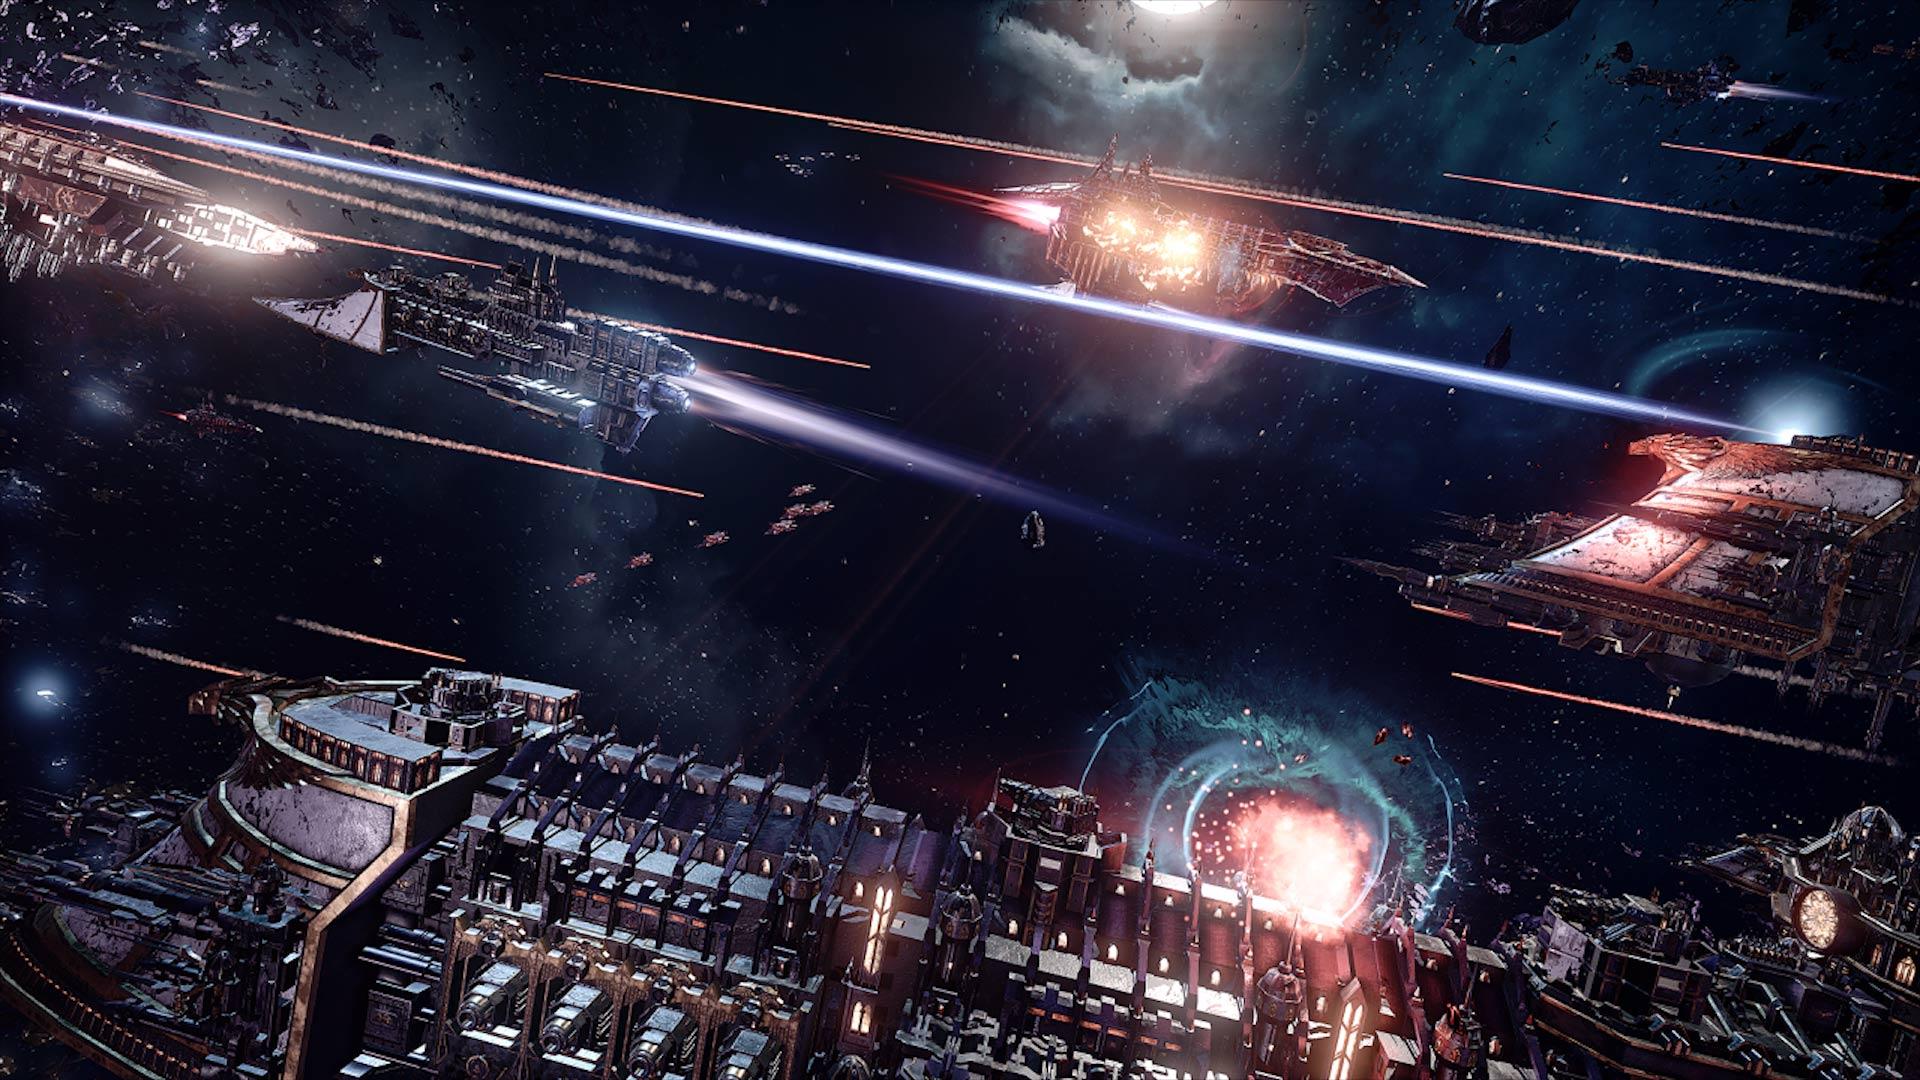 Andromeda Galaxy Wallpaper Iphone Battlefleet Gothic Armada Hd Wallpaper Background Image